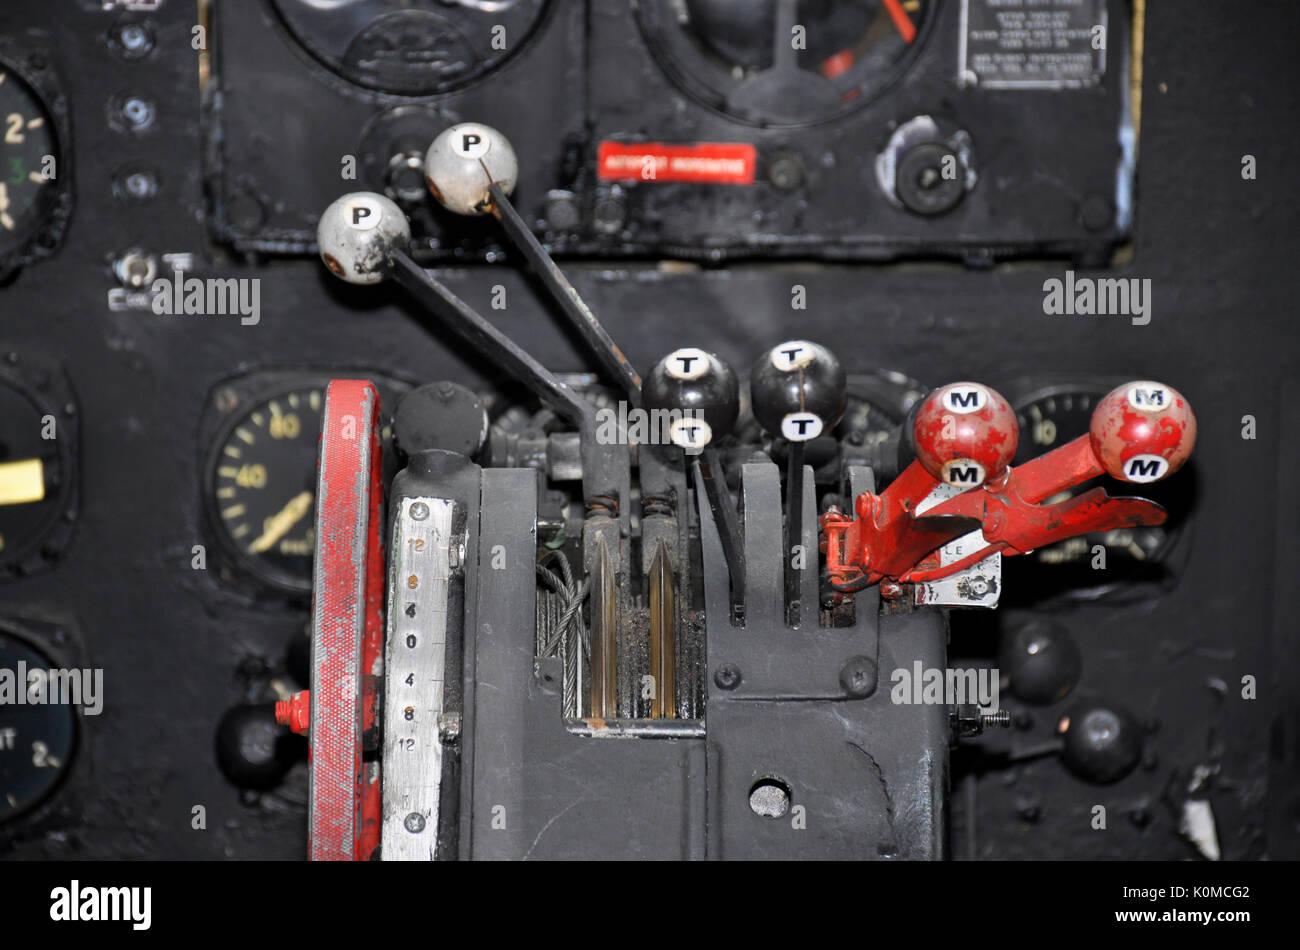 DC-3 throttles - Stock Image